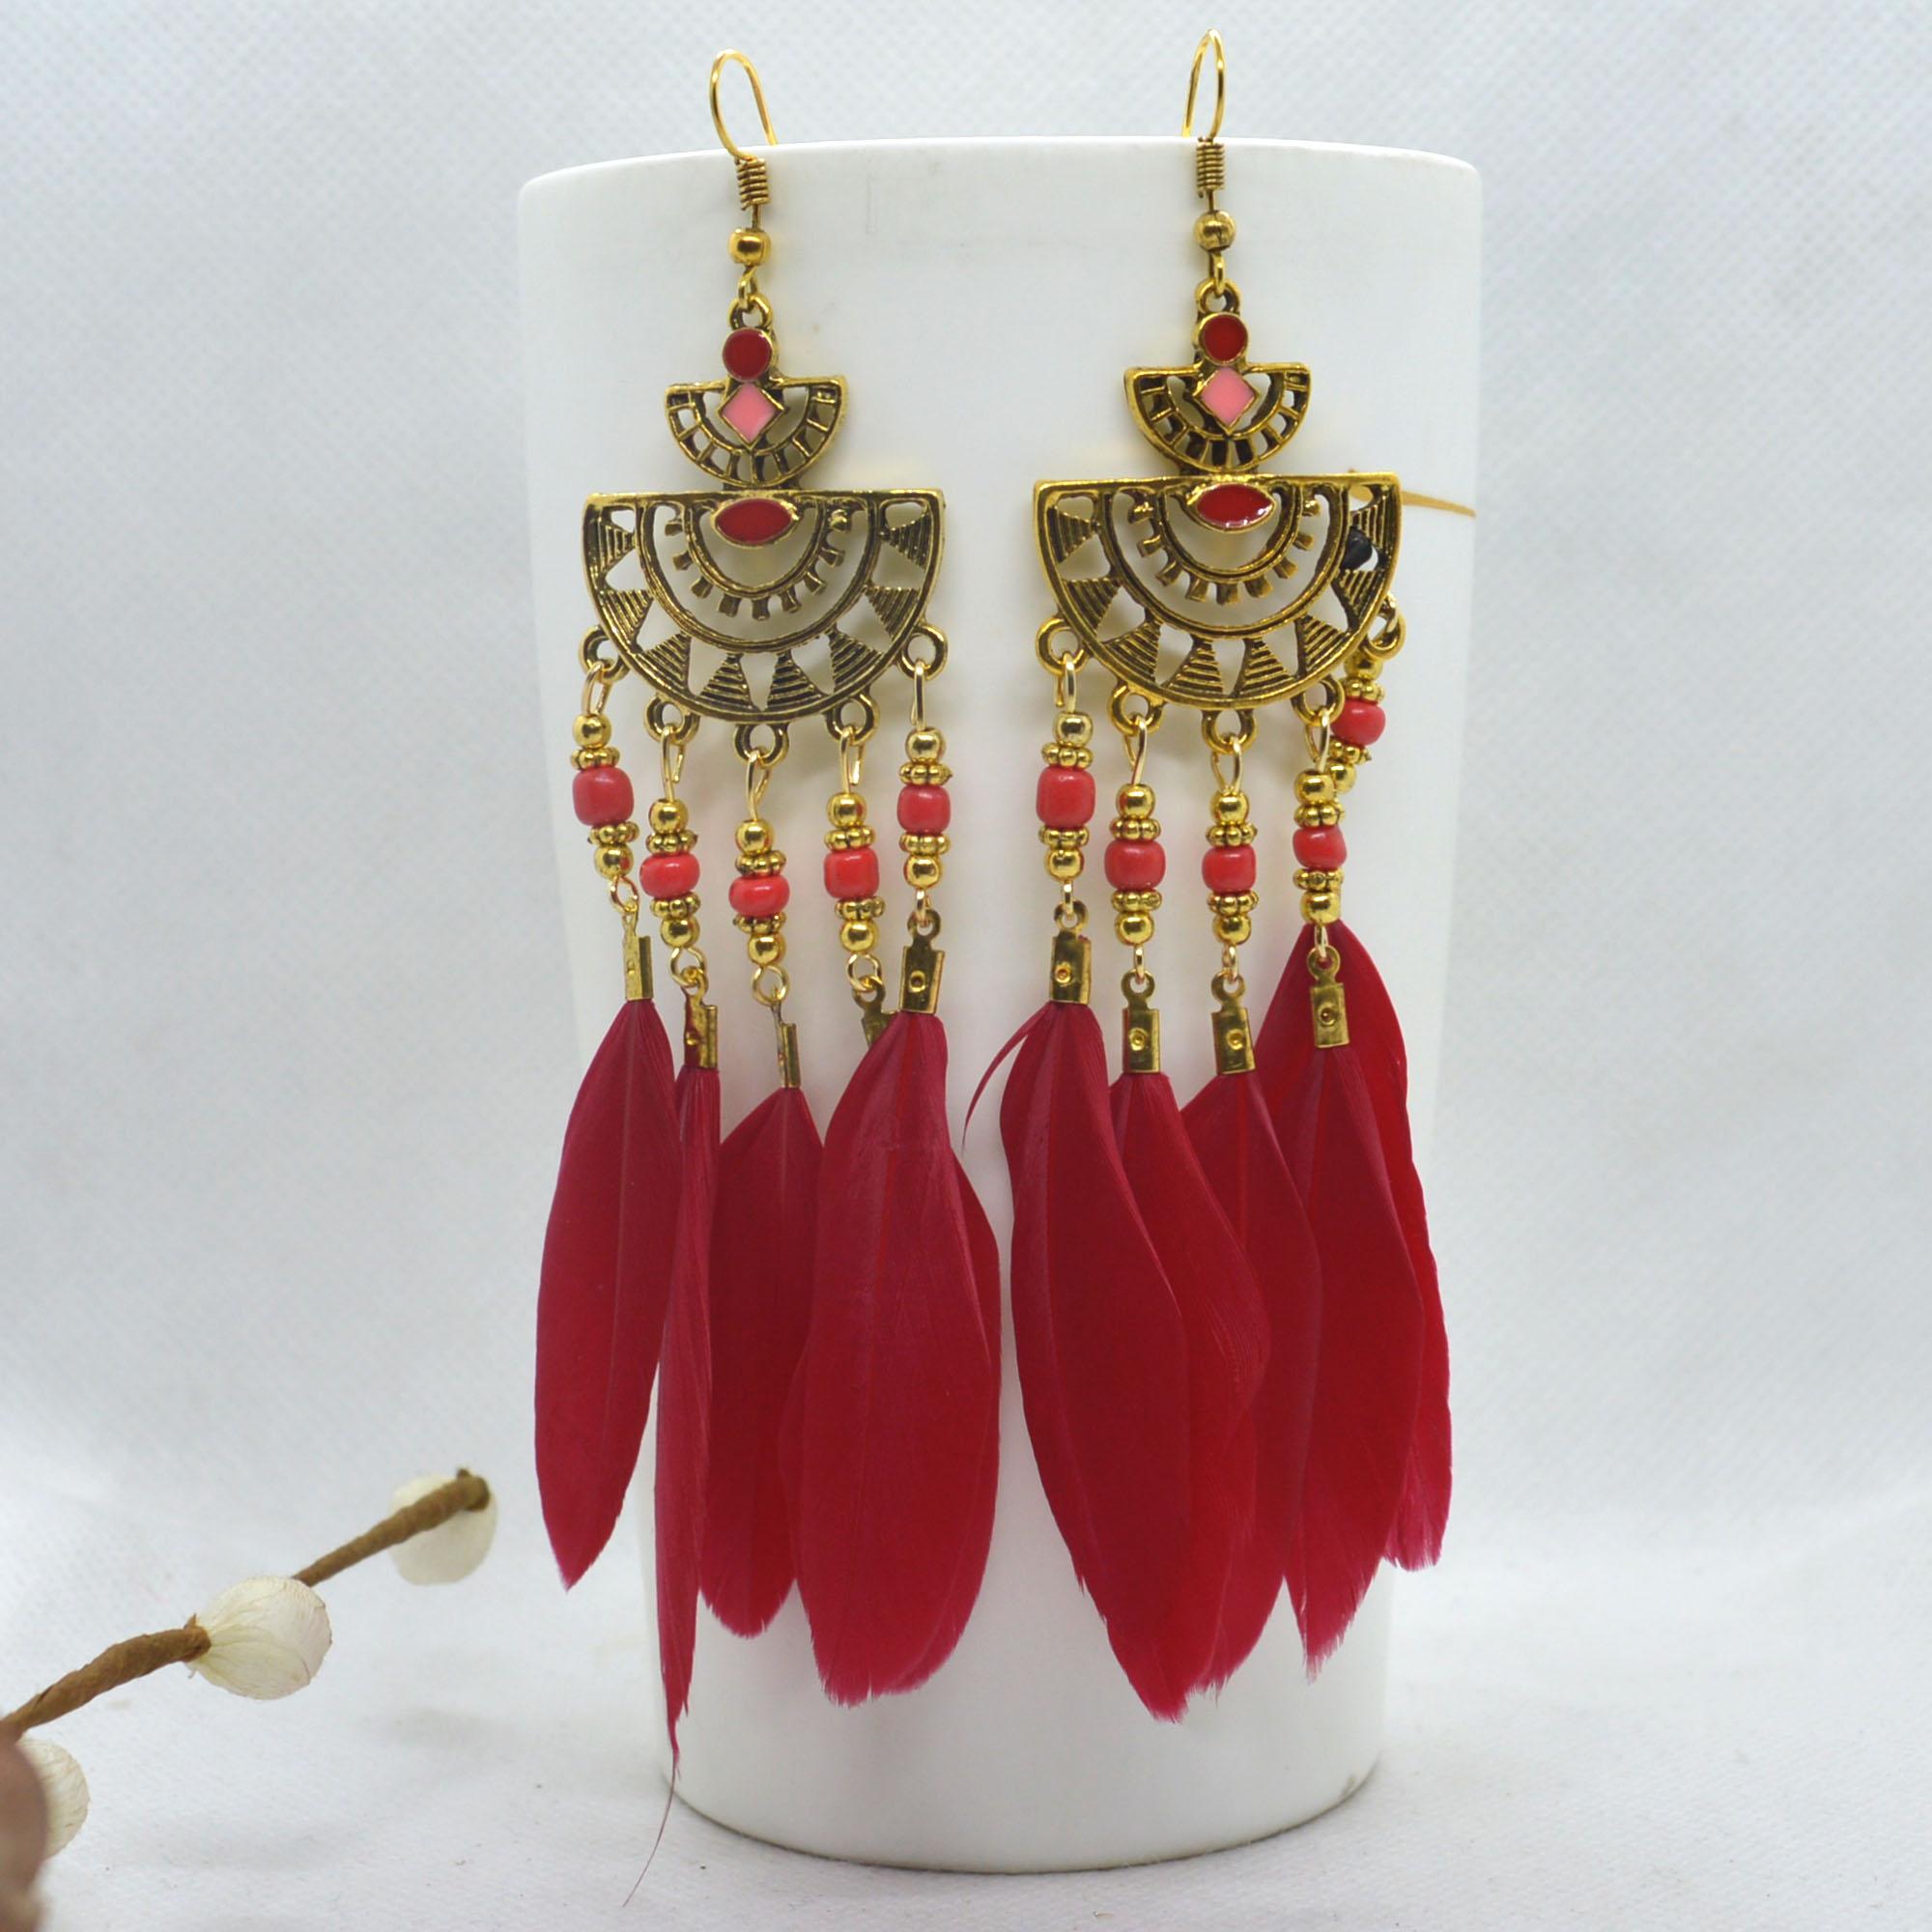 Boho Style Golden Tribal Desig...